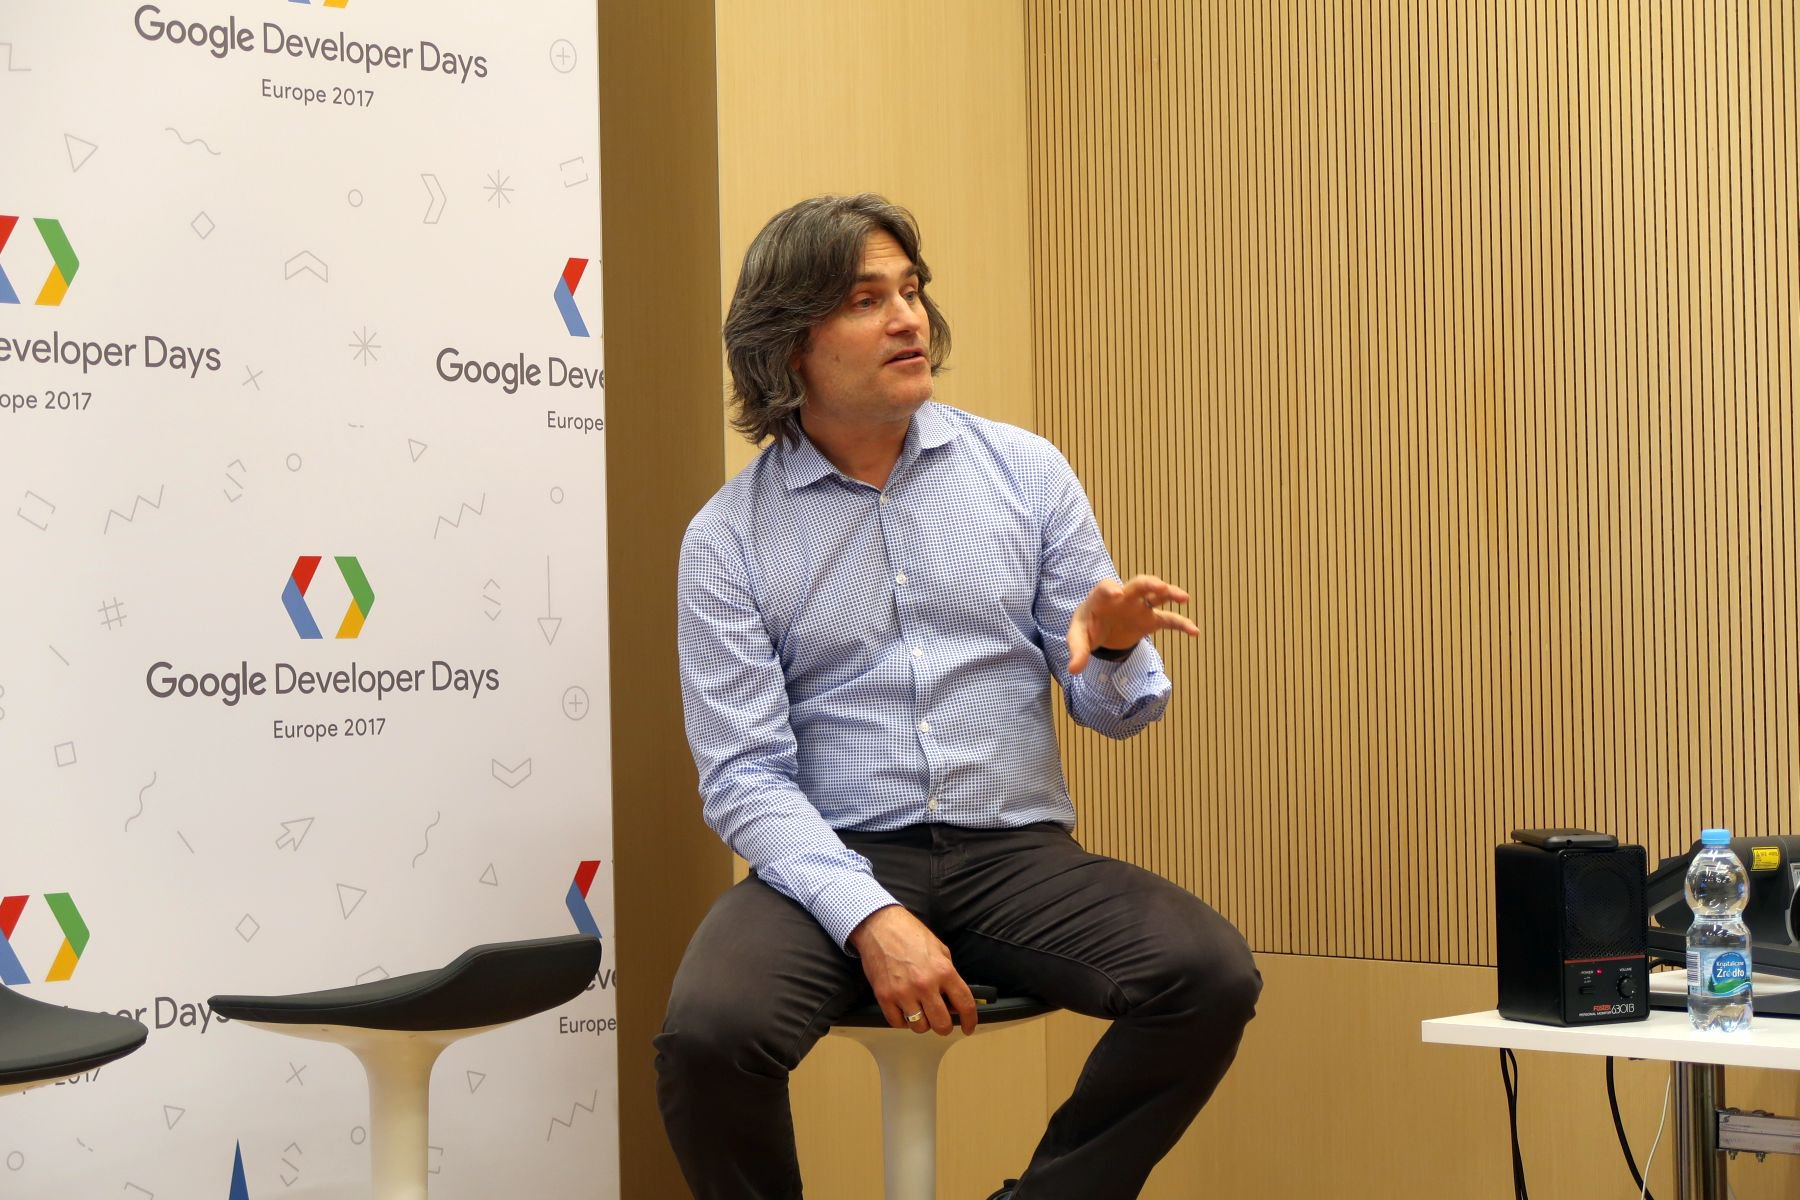 Jason Titis, VP for the Developer Product Group at Google